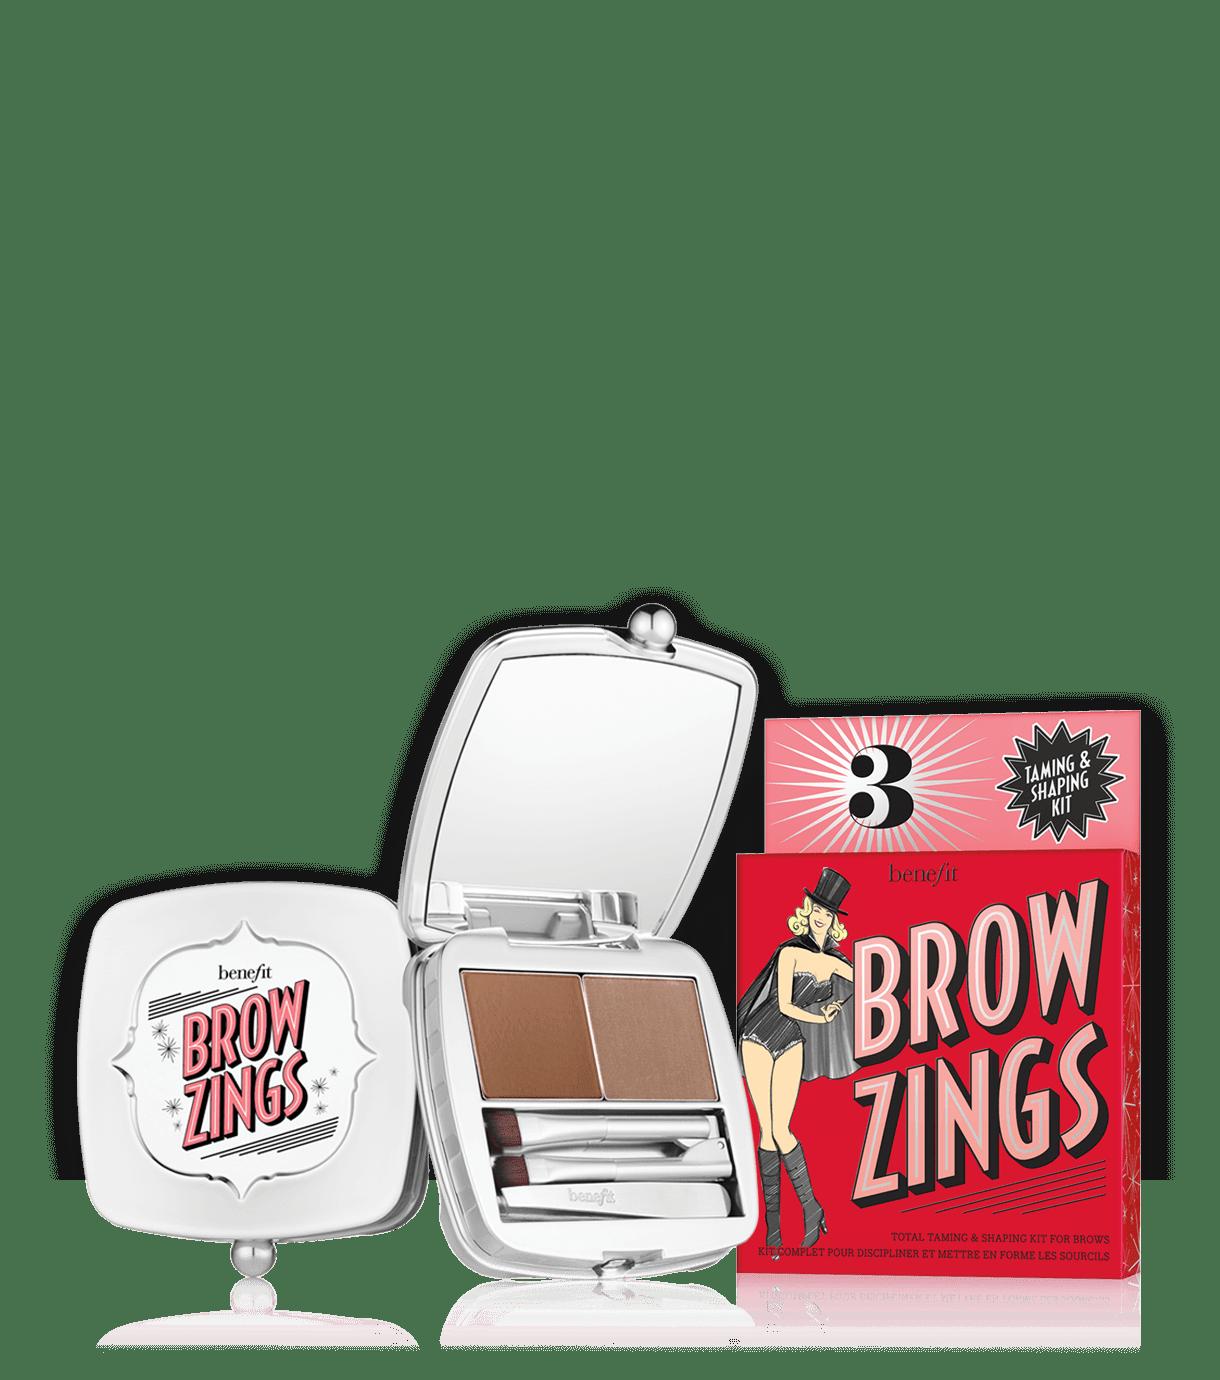 Brow zings shaping kit. Eyebrow clipart bushy eyebrow